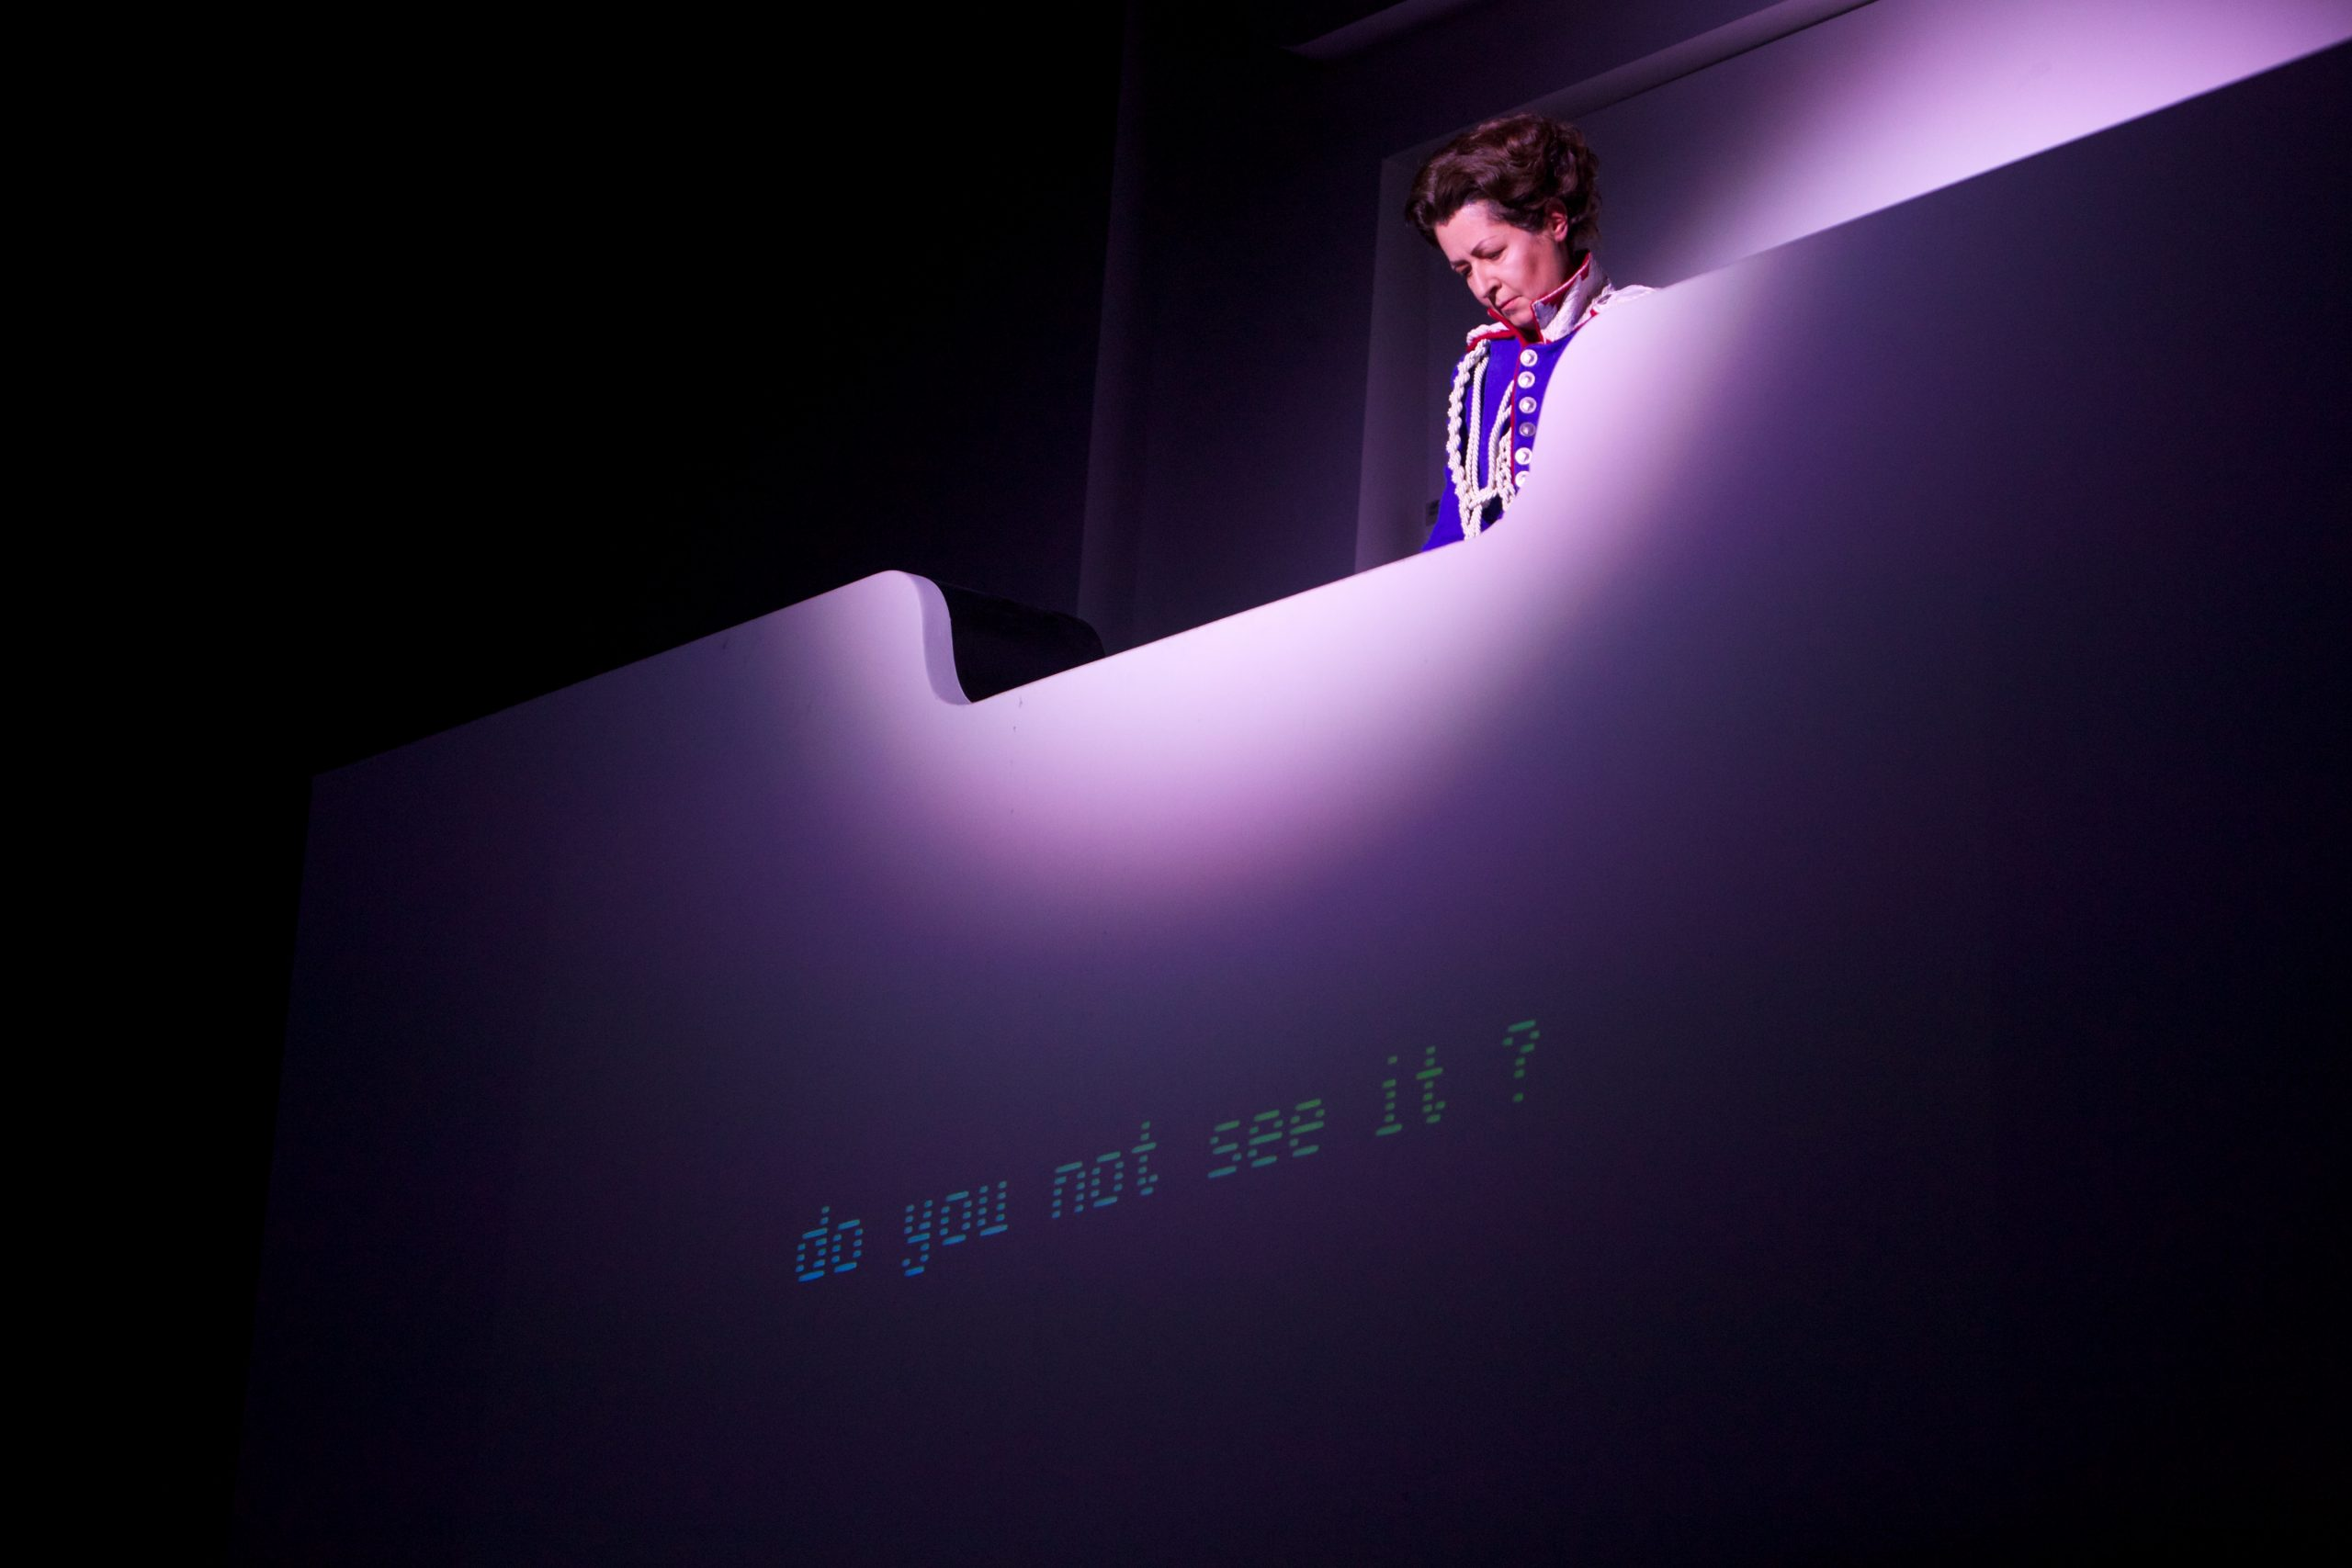 Dominique Gonzalez-Foerster, Stage It, 2013